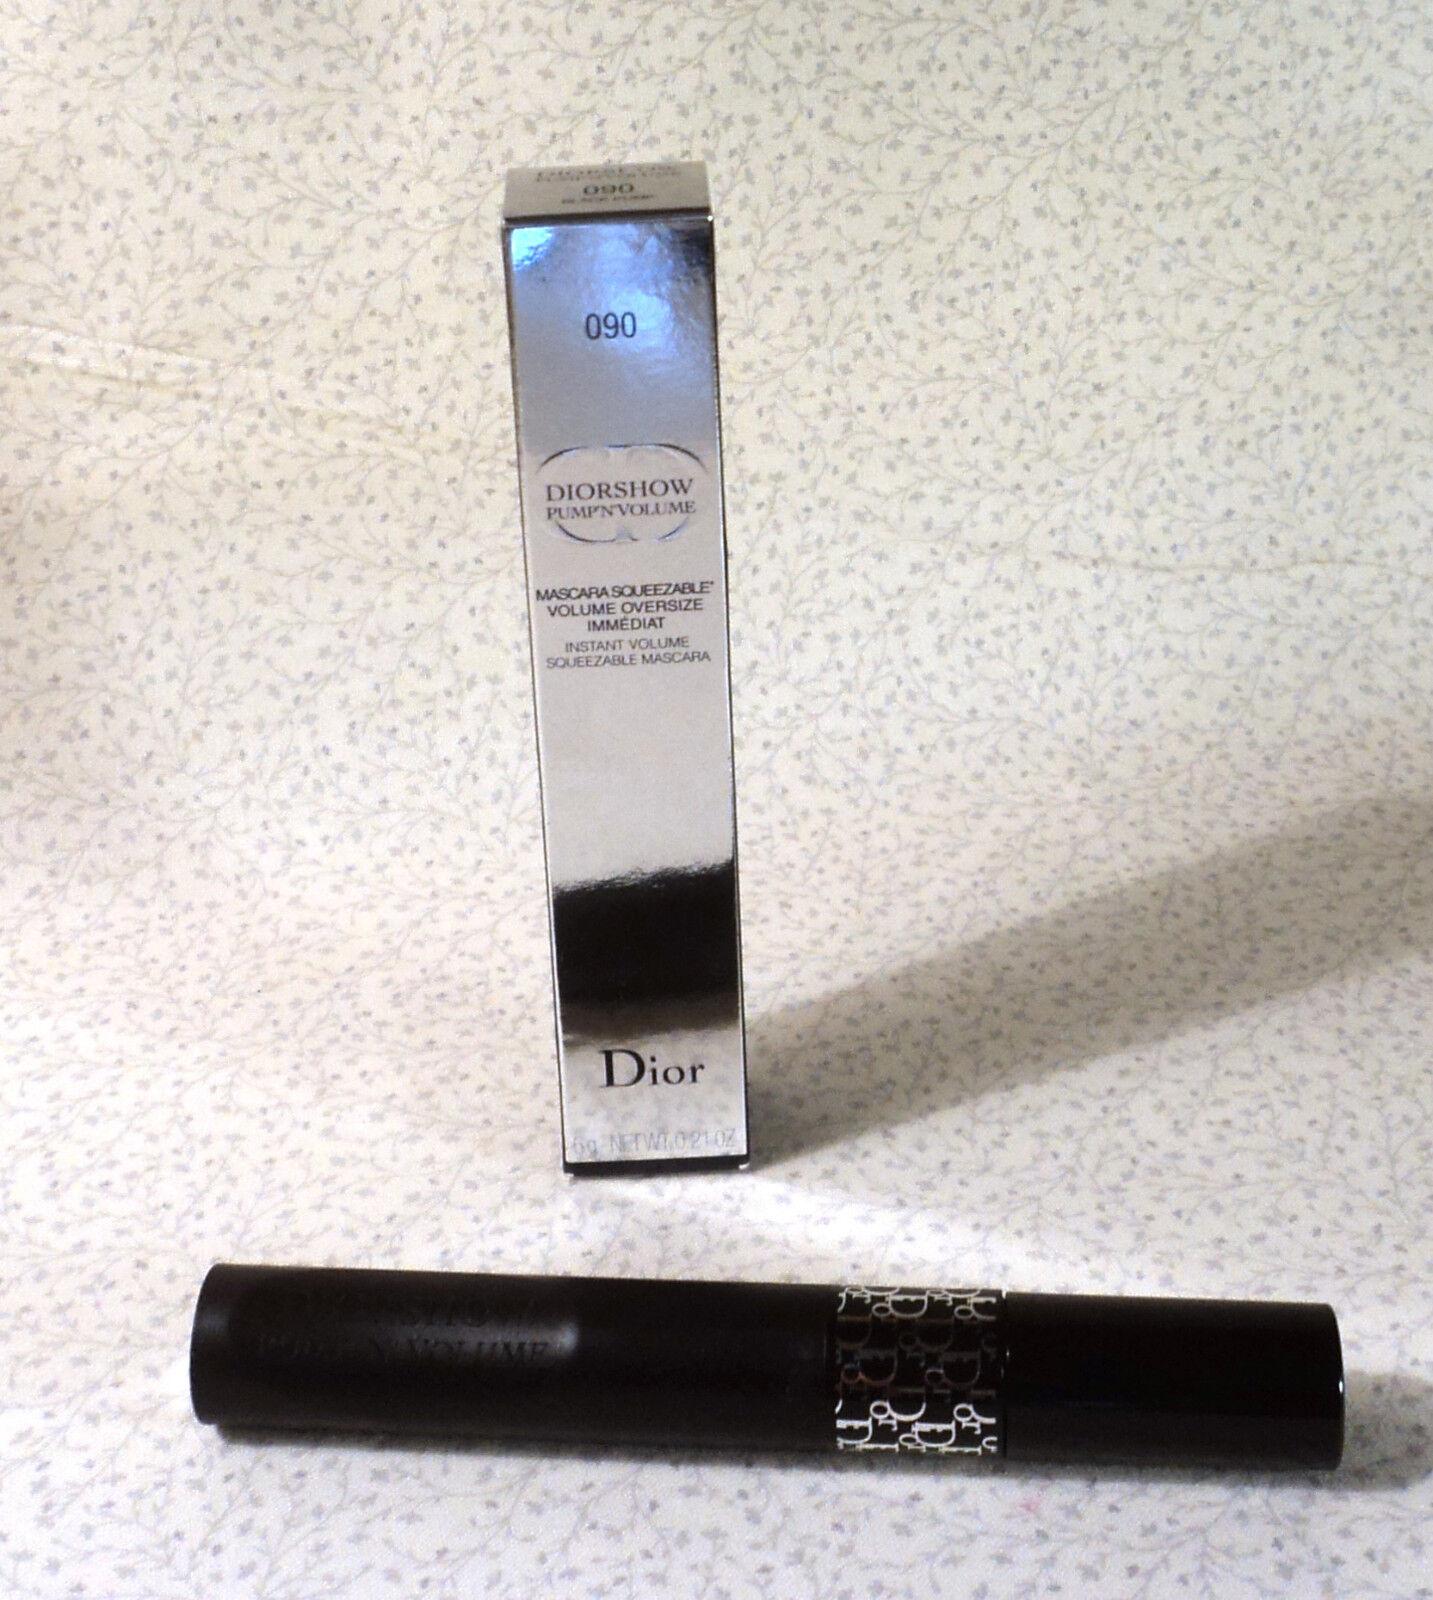 f62c529b4d6 Christian Dior Diorshow Iconic Mascara for sale online   eBay